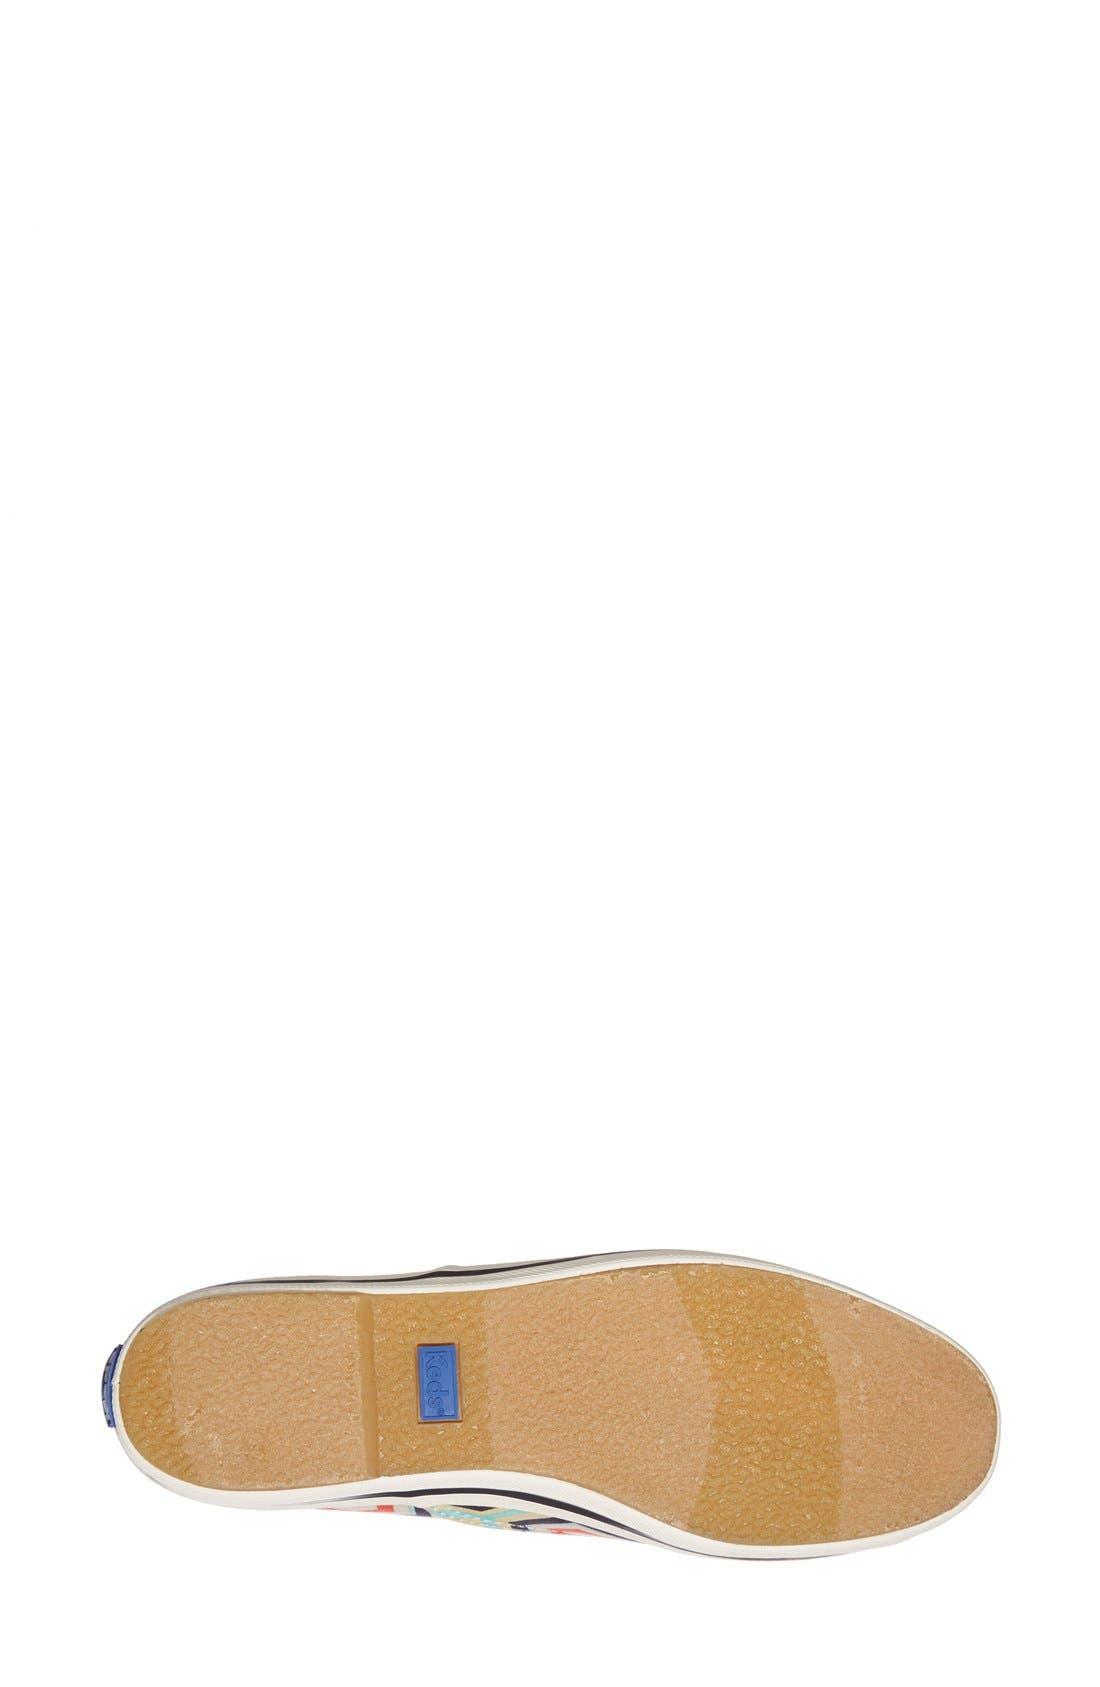 Alternate Image 4  - Keds® for kate spade new york 'champ' print canvas sneaker